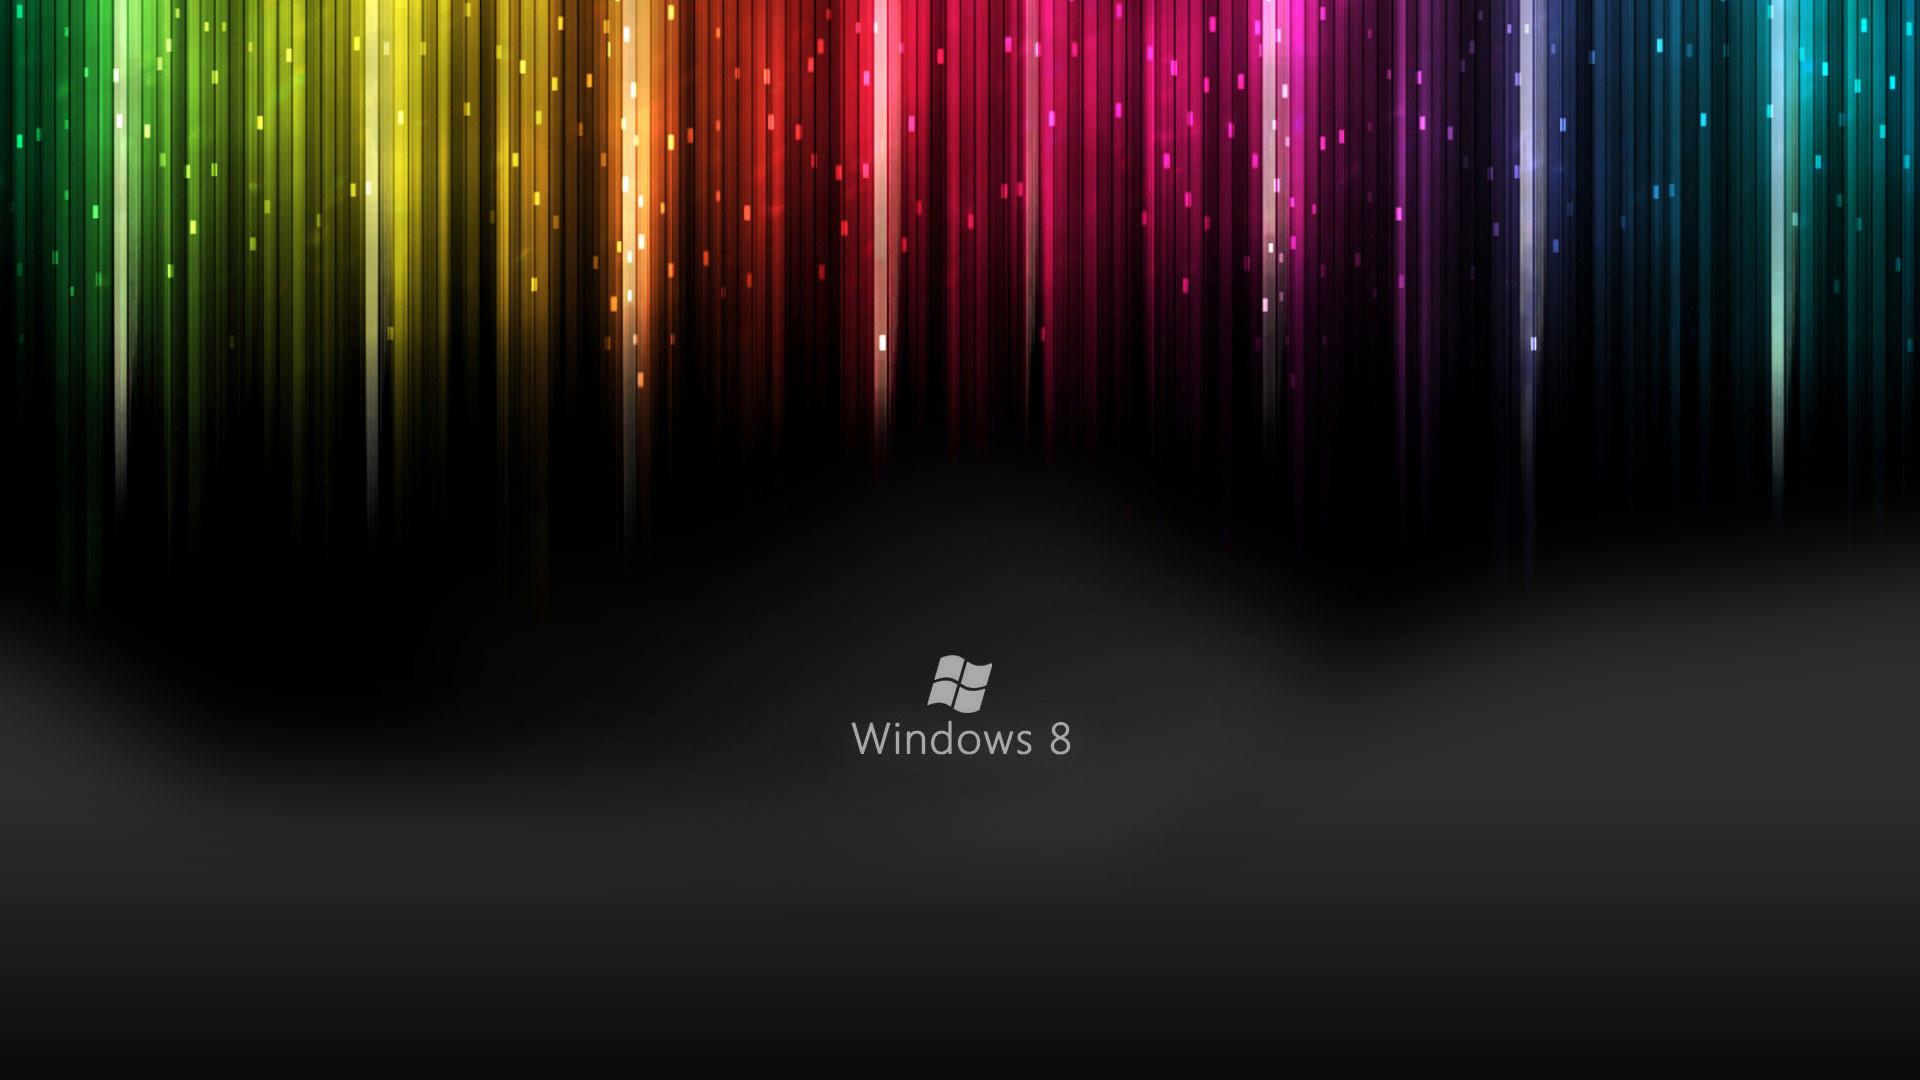 Windows 8 Live Wallpaper Pc